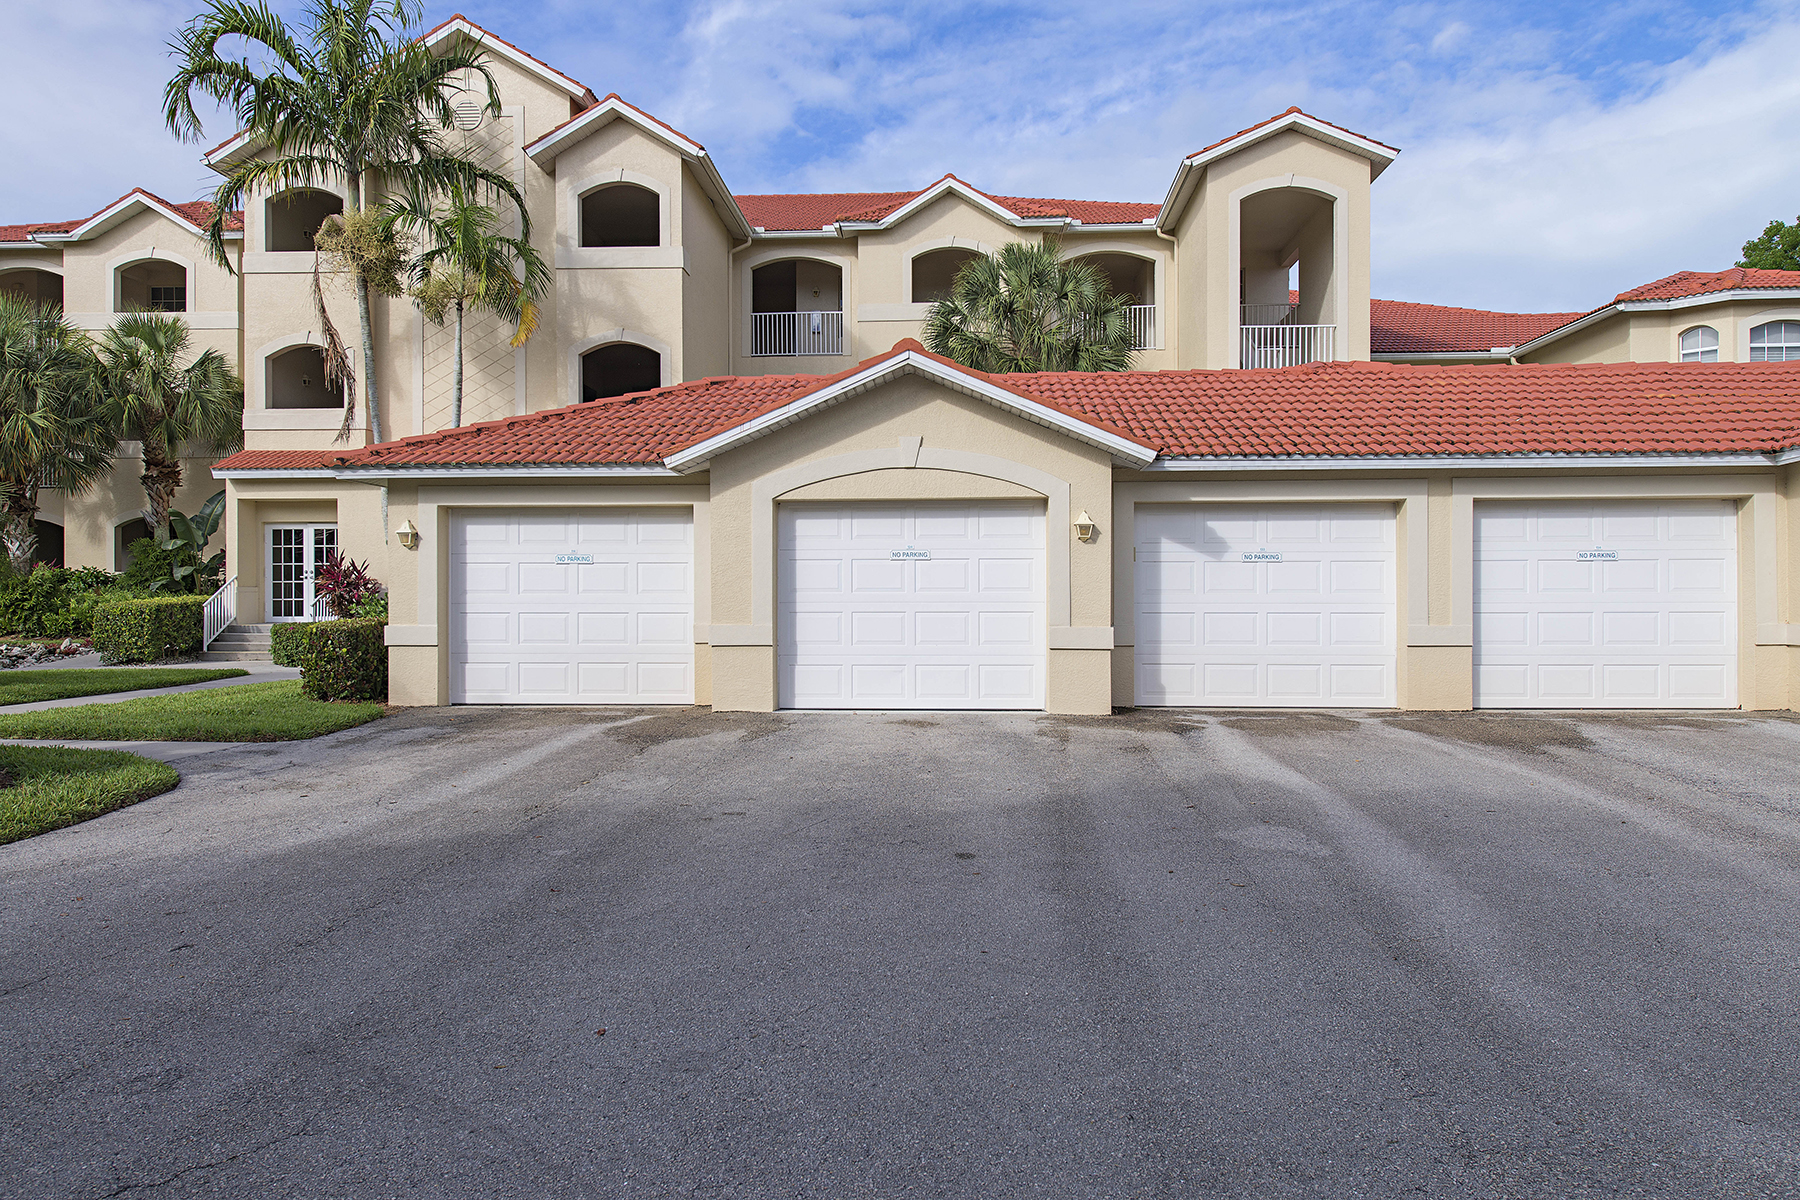 Nhà chung cư vì Bán tại WINDSTAR - WINDWARD CAY 4650 Yacht Harbor Dr 125 Naples, Florida 34112 Hoa Kỳ